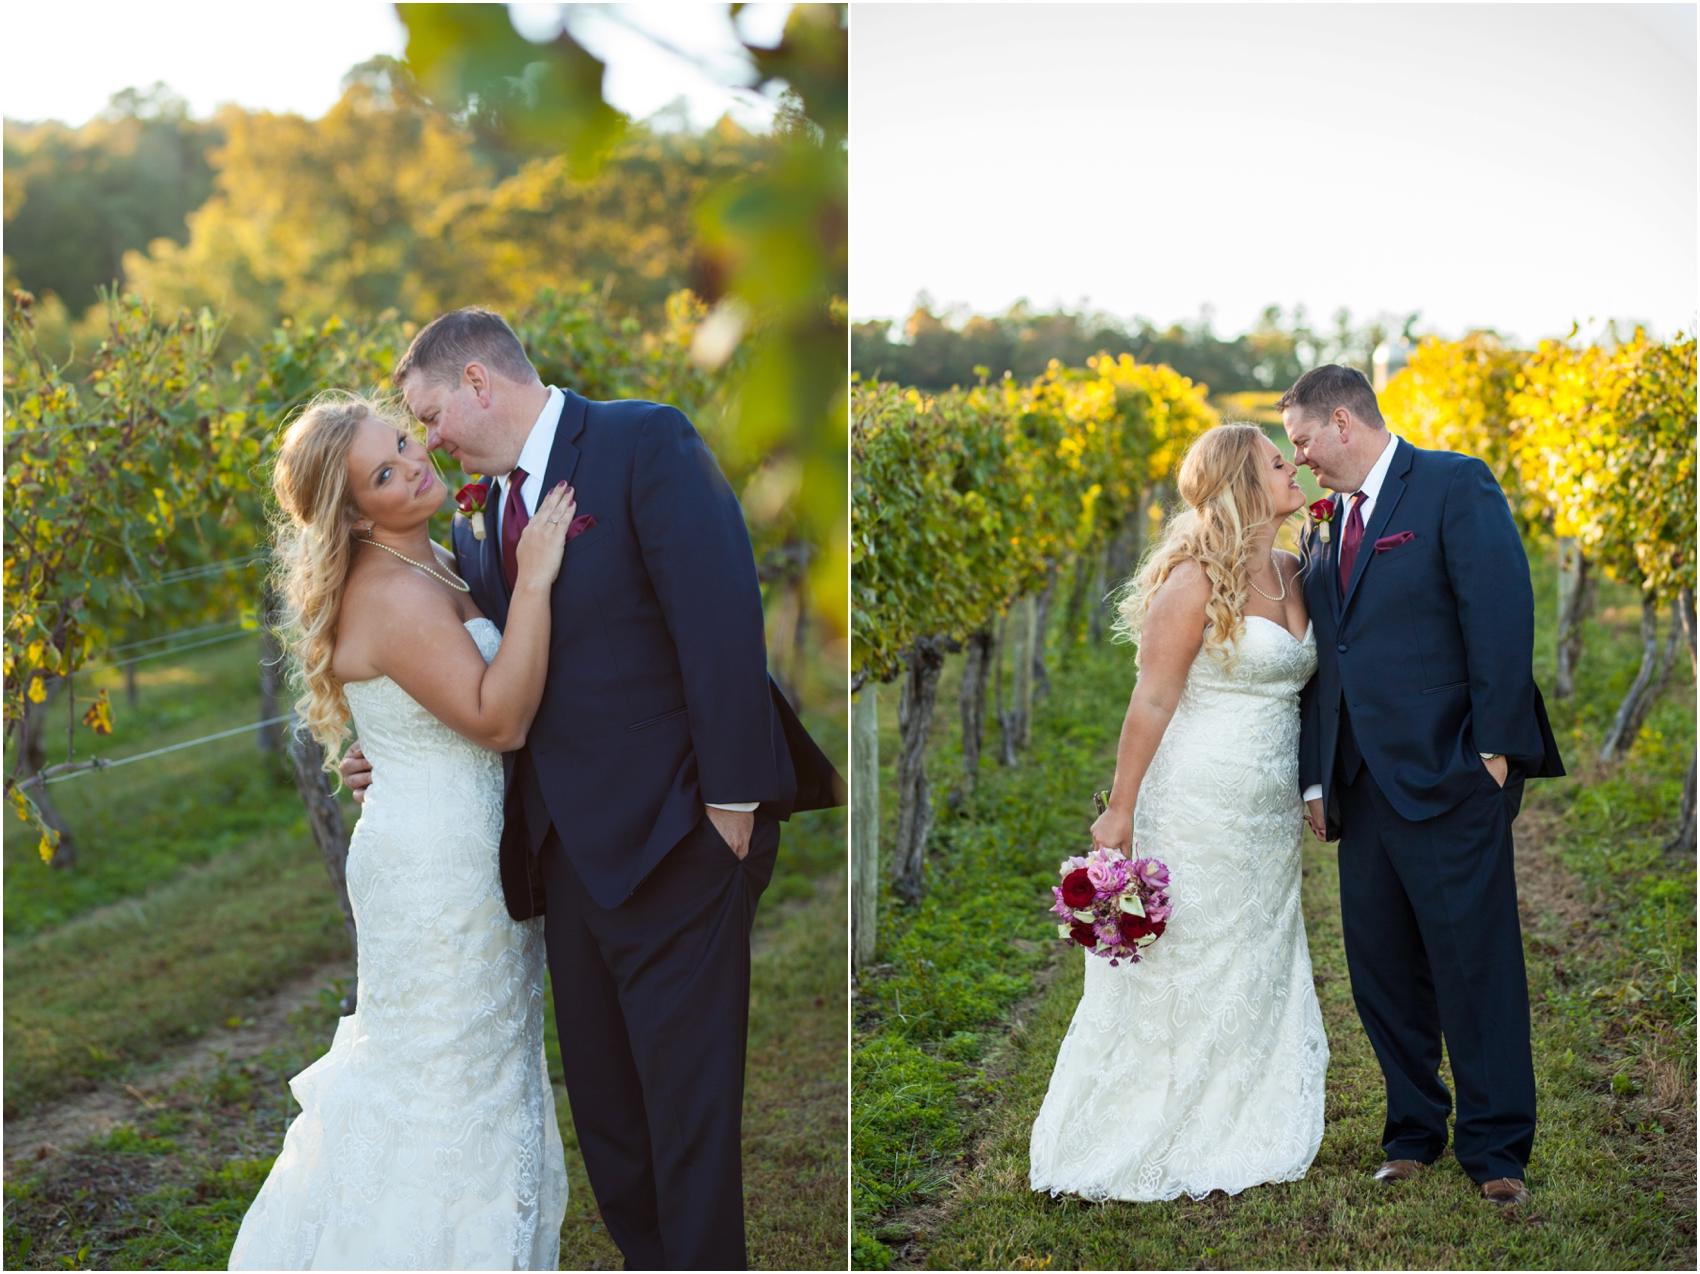 Grace-Estate-Winery-Fall-Virginia-Wedding-6908.jpg